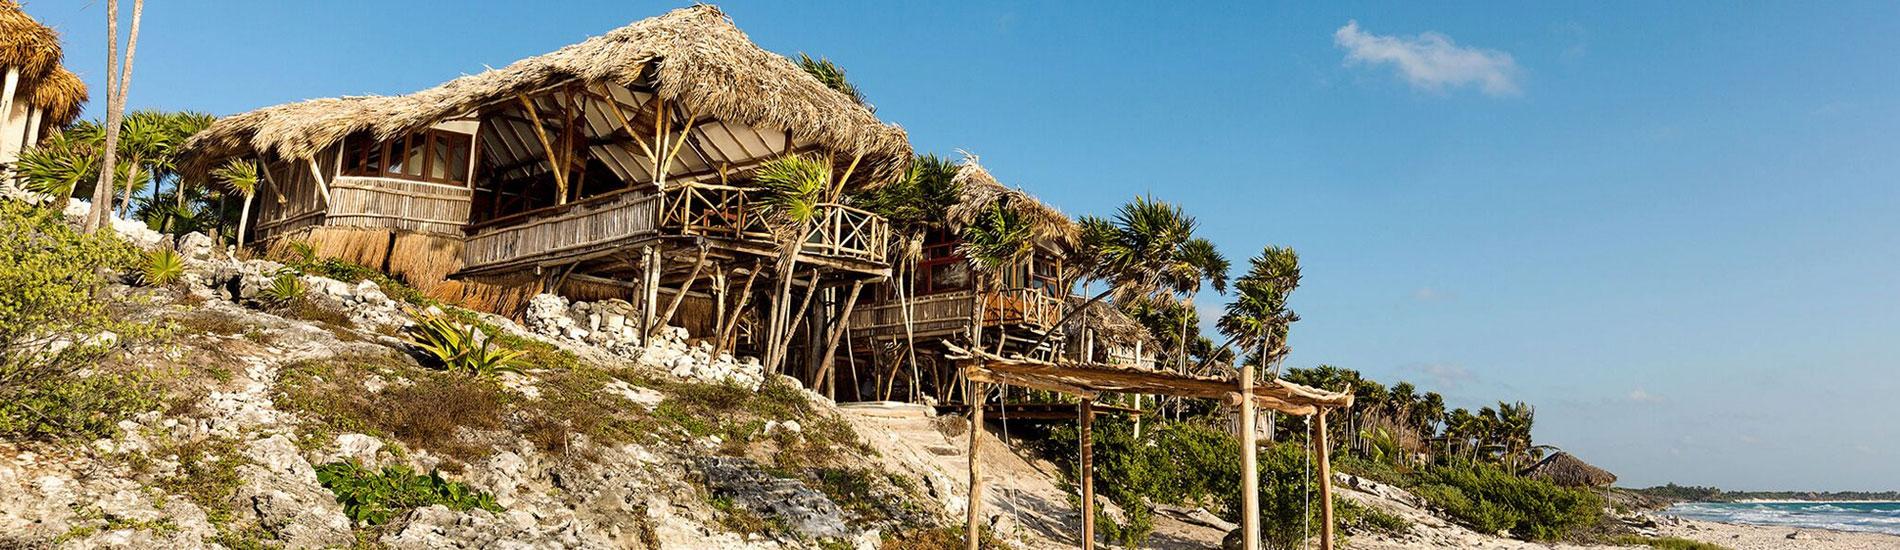 Casa madera riviera maya journey mexico luxury villas for Villas tulum